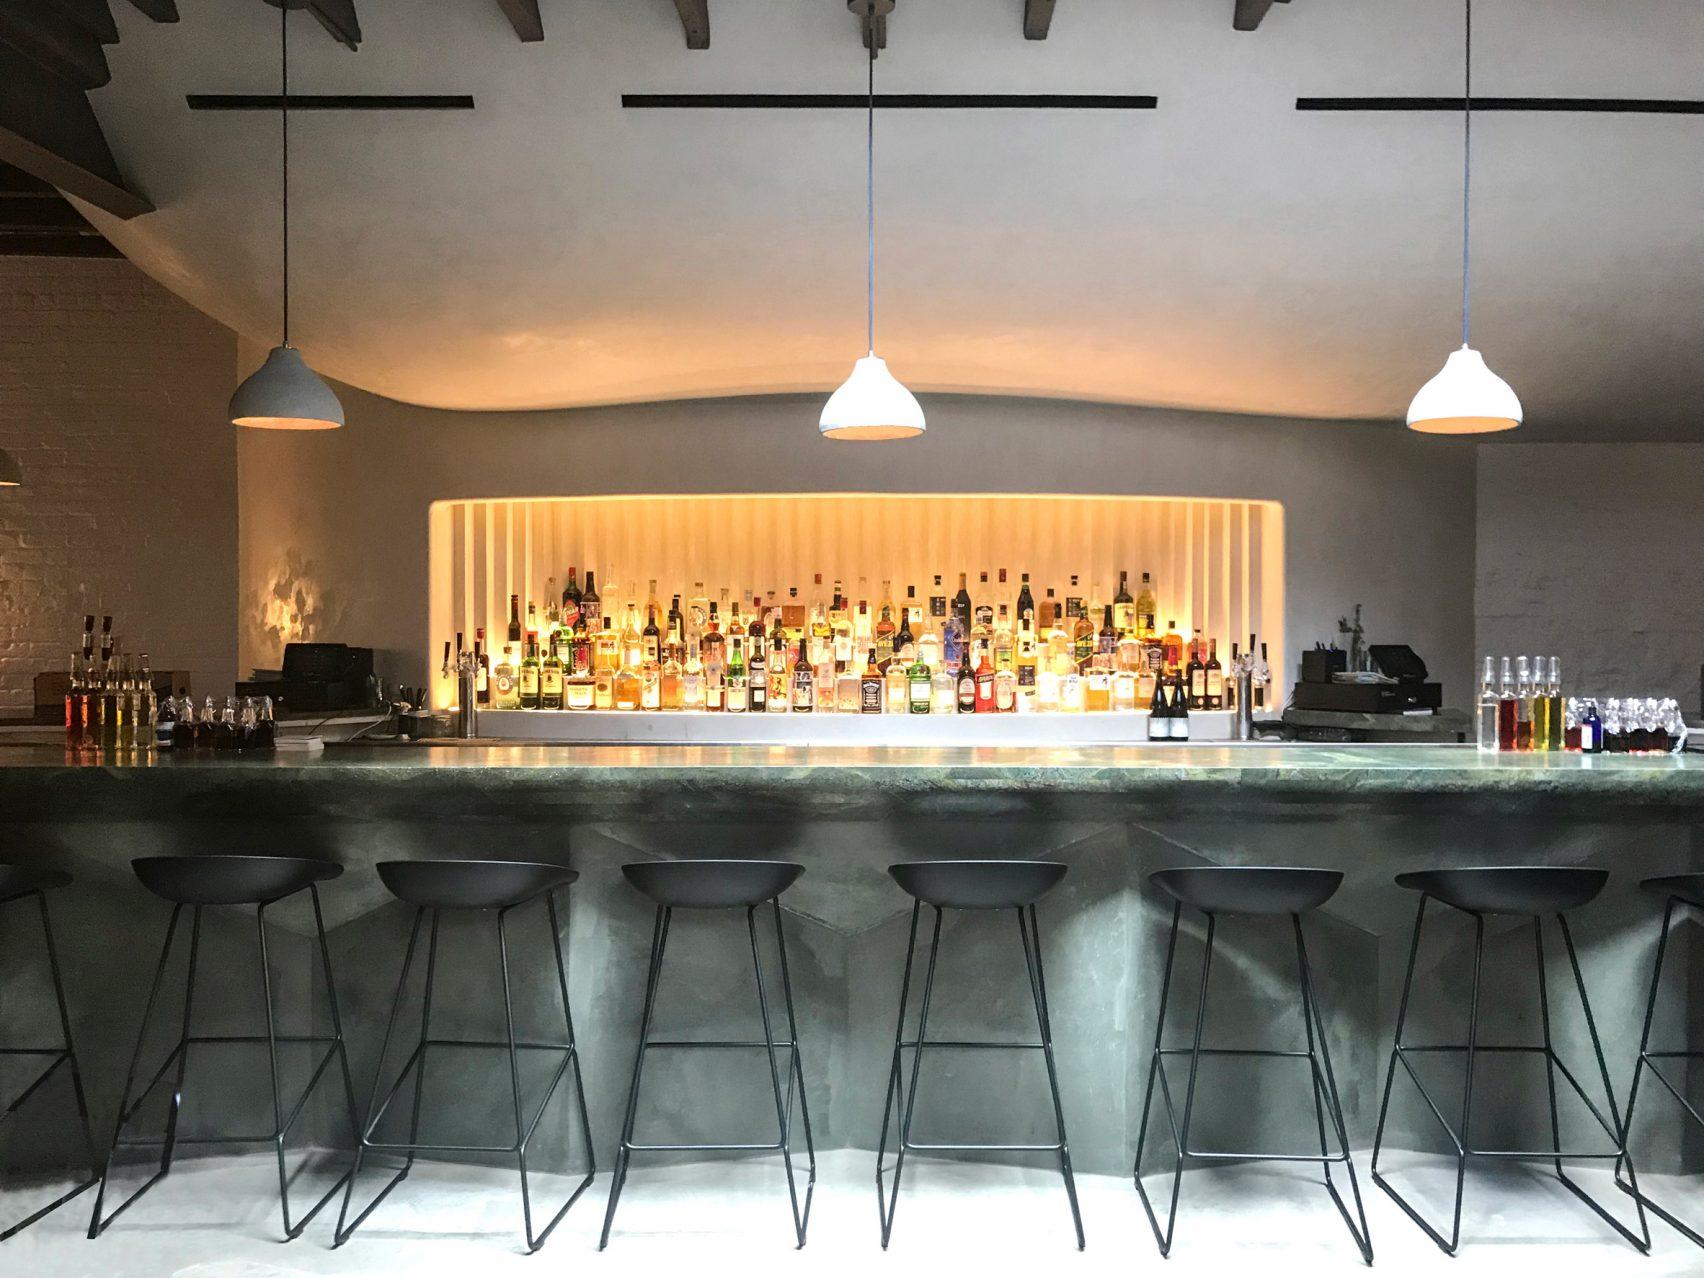 bar-beau-coffee-cocktail-isaac-rae-williamsburg-brooklyn-new-york_dezeen_2364_col_4-1704x1278.jpg